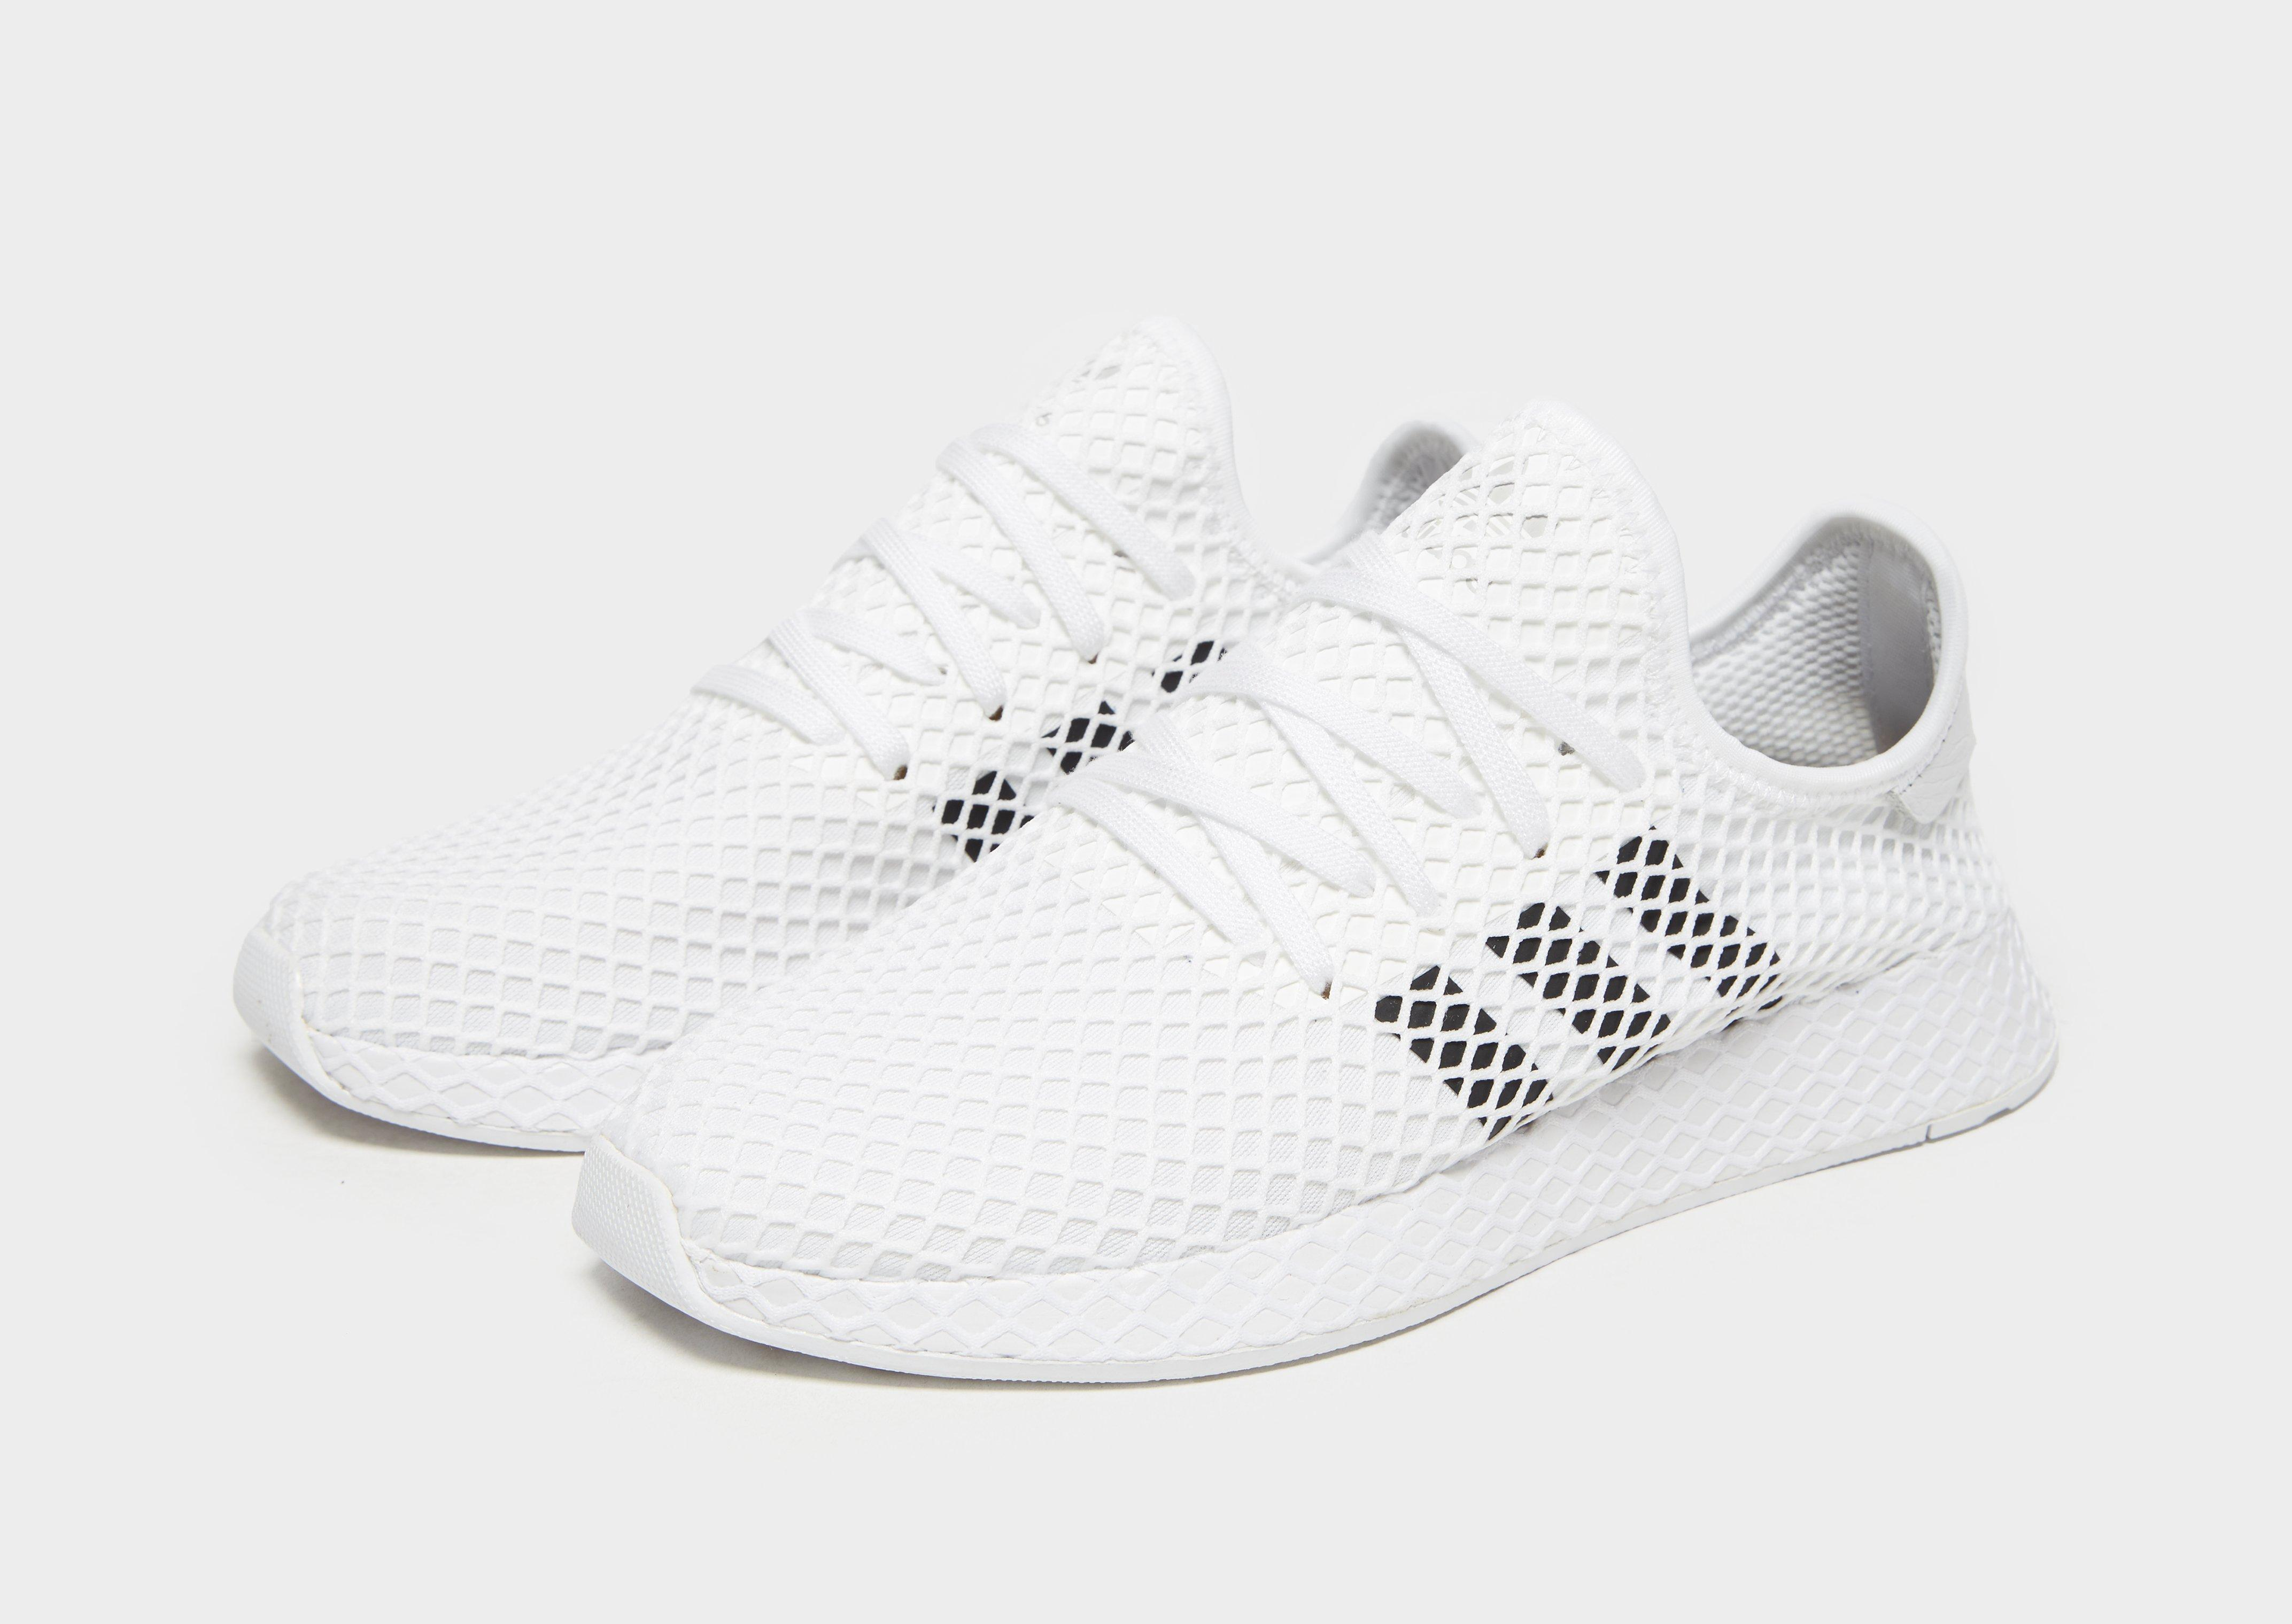 da5a3e84e Lyst - Adidas Originals Deerupt in White for Men